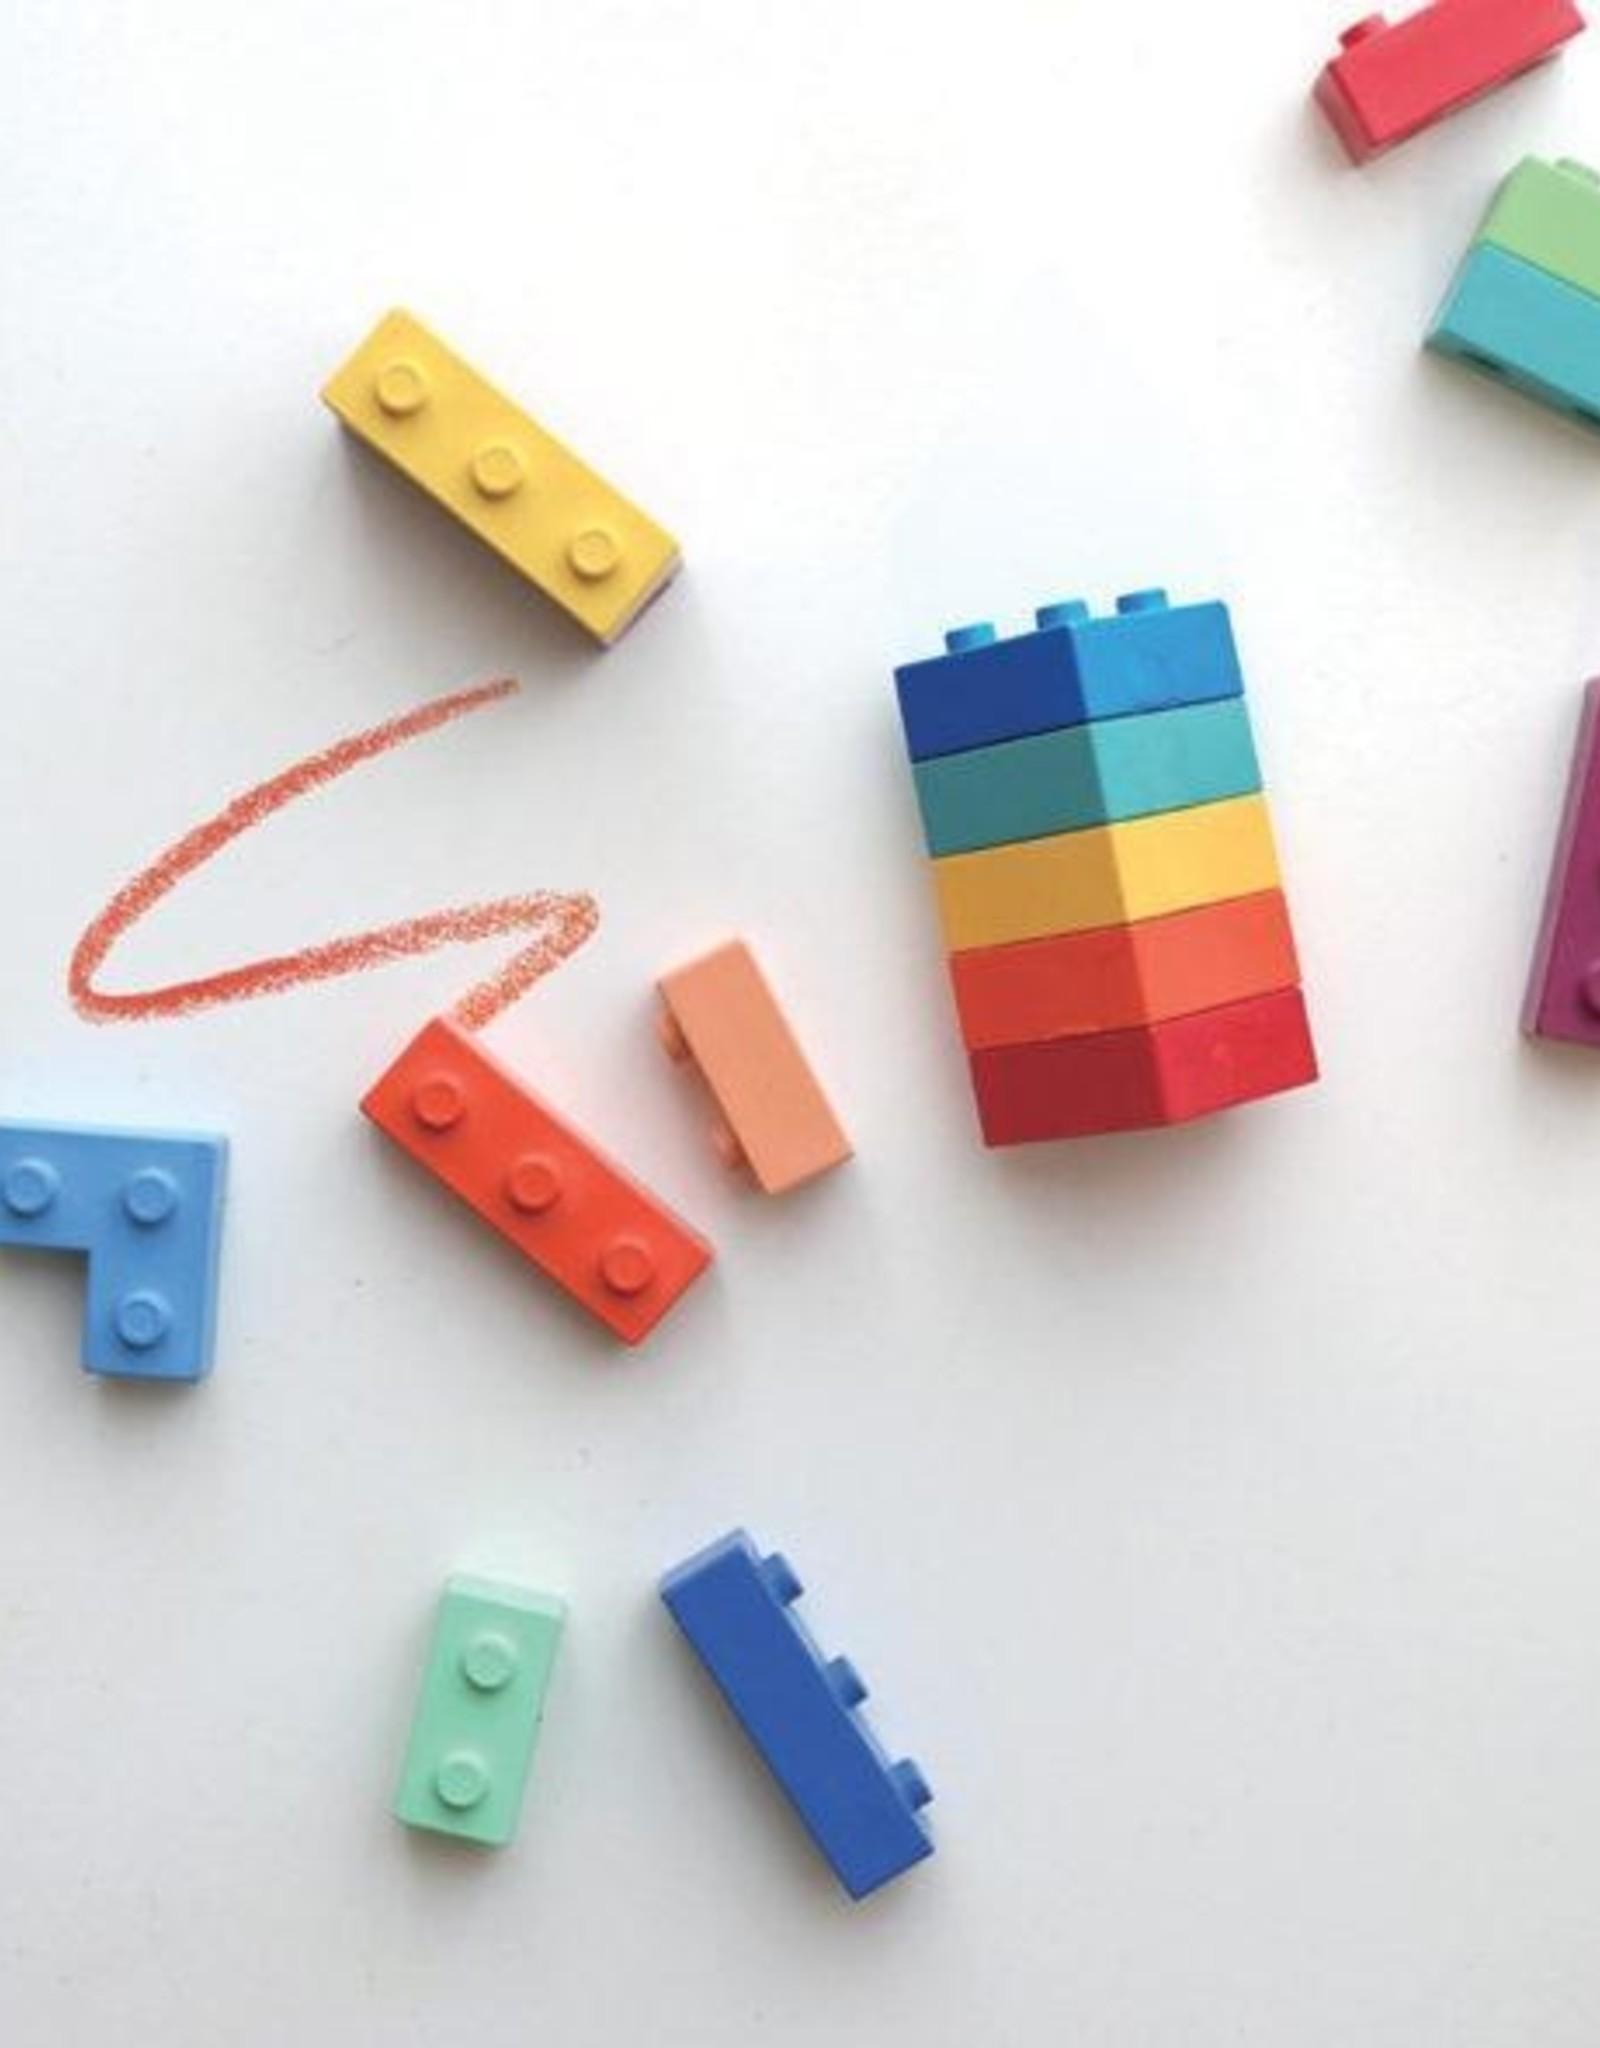 Goober Pocket Seasons Crayons